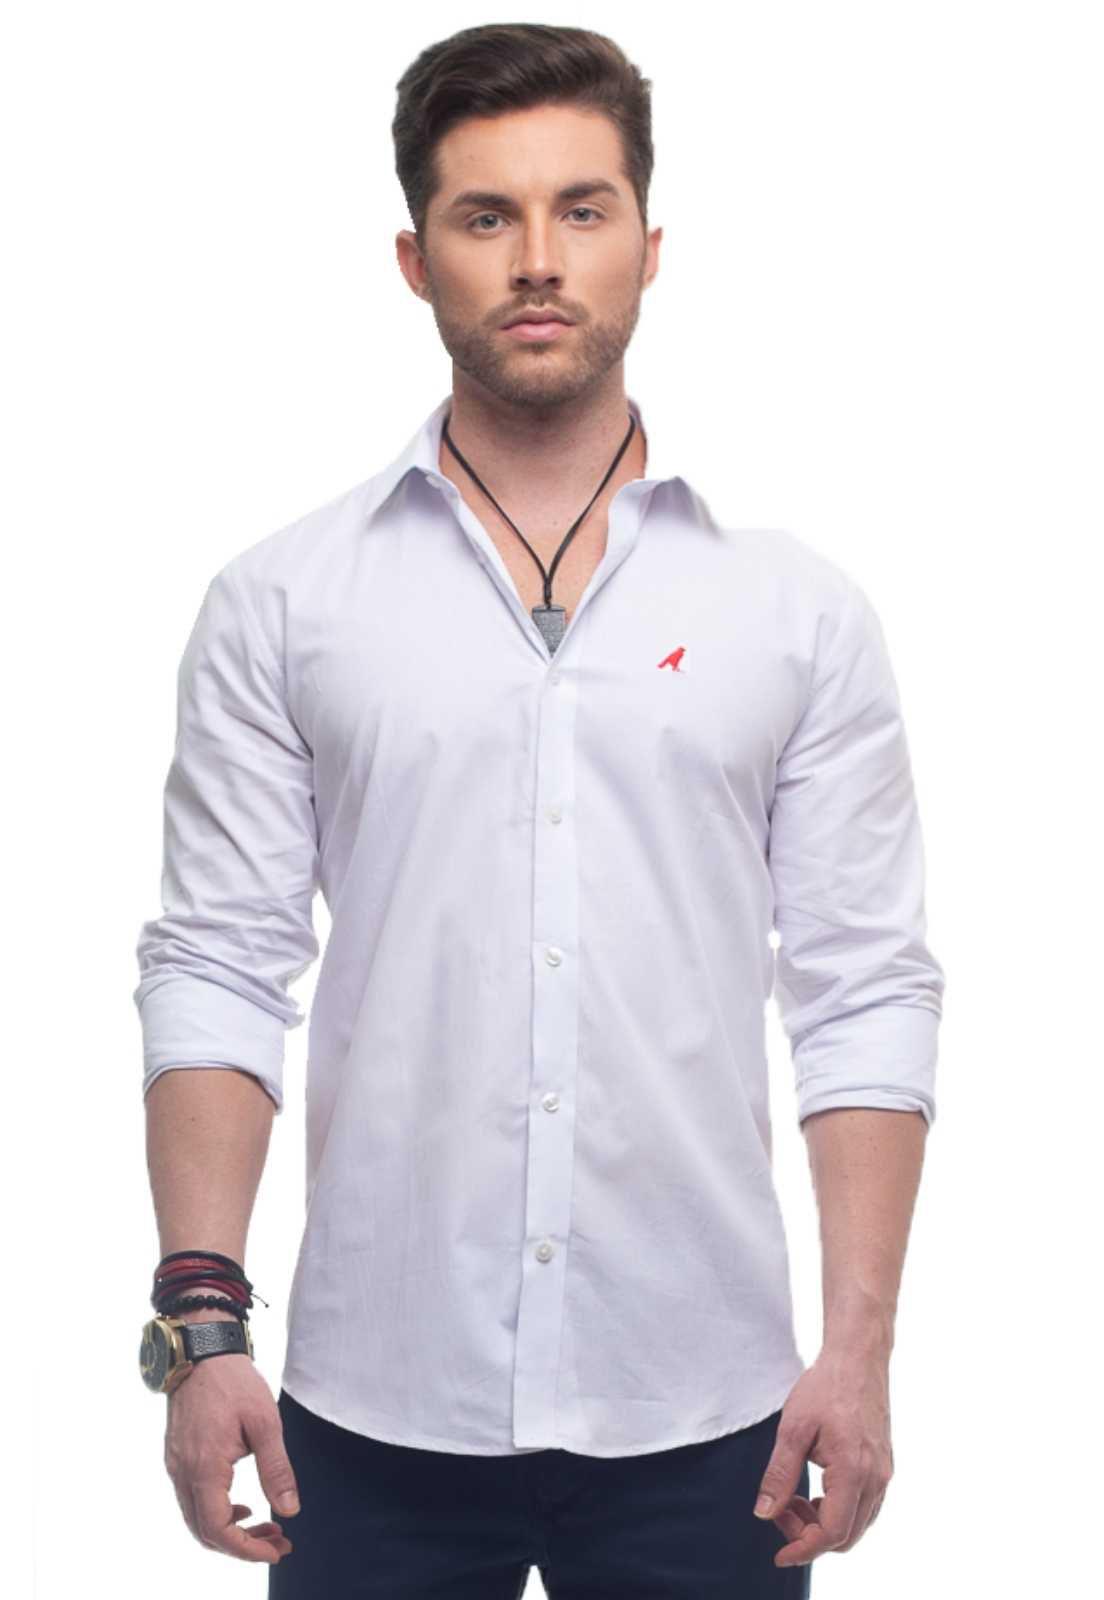 Camisa Social Masculina Branca